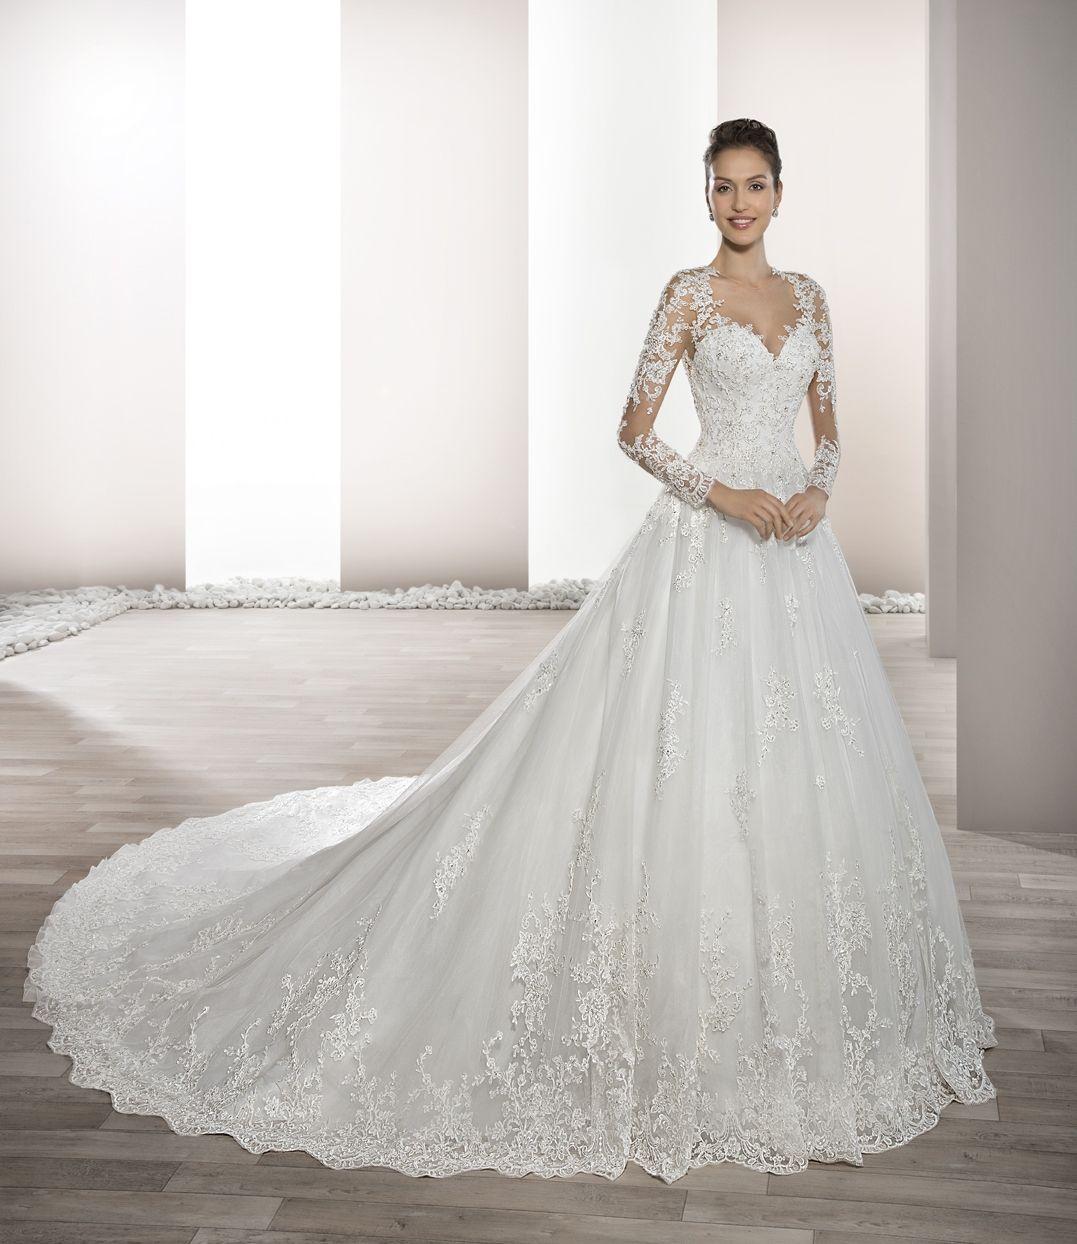 Vestido de Novia de Demetrios - 732 | Wedding dresses | Pinterest ...